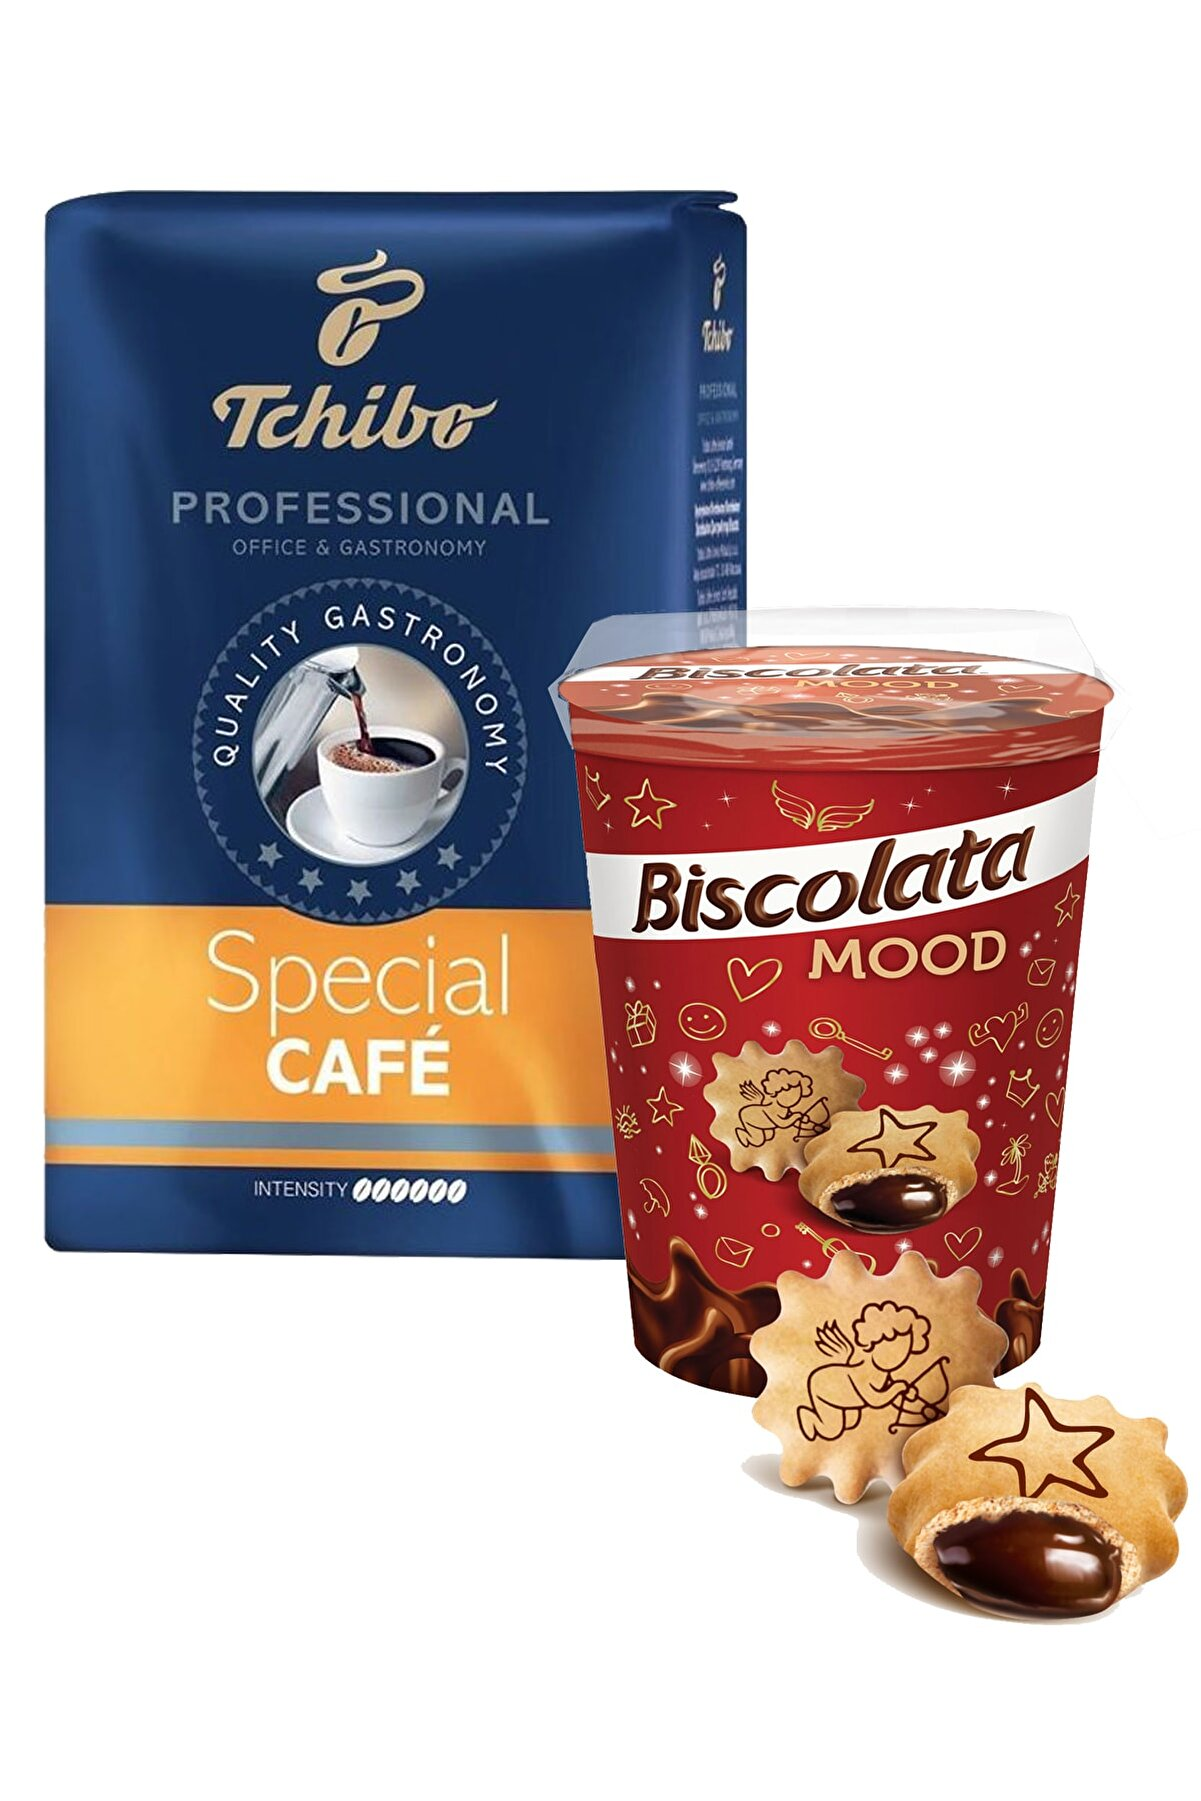 Tchibo Biscolata Mood Çikolatalı - Special Filtre Kahve Keyfi